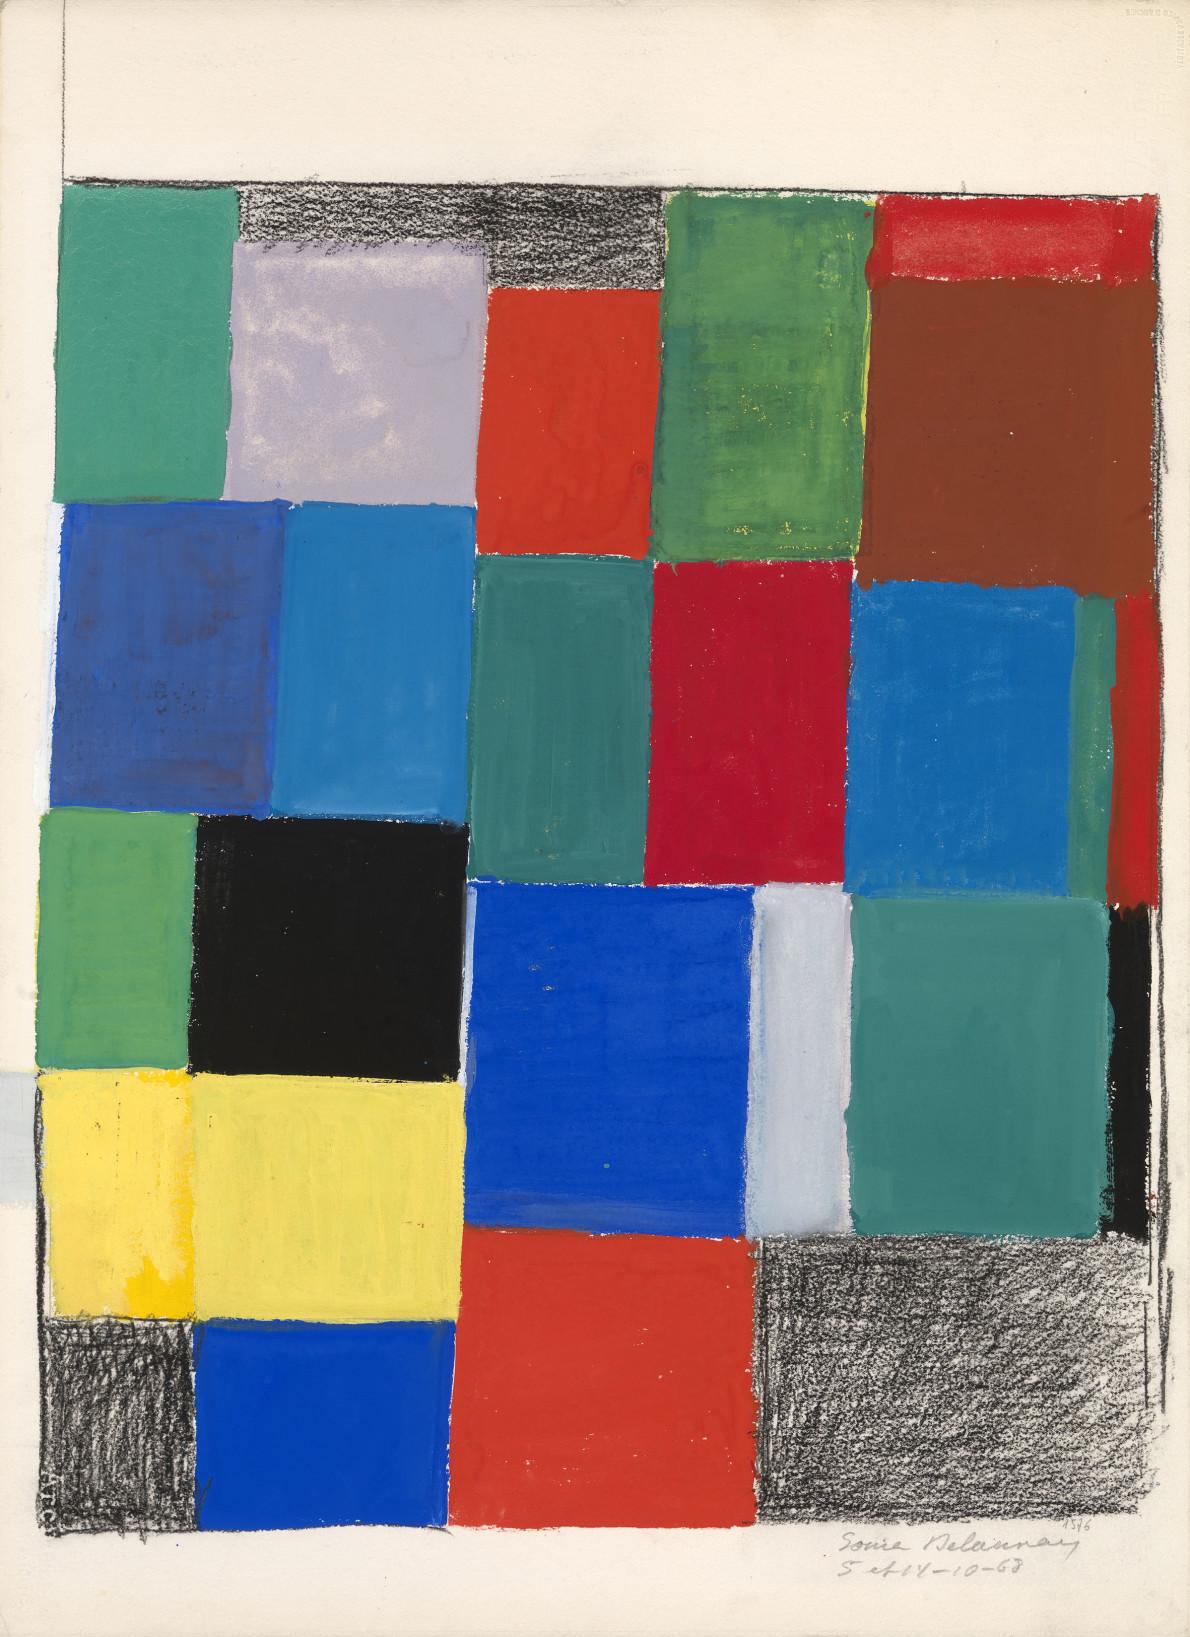 Sonia Delaunay, Rythme couleur, 1968